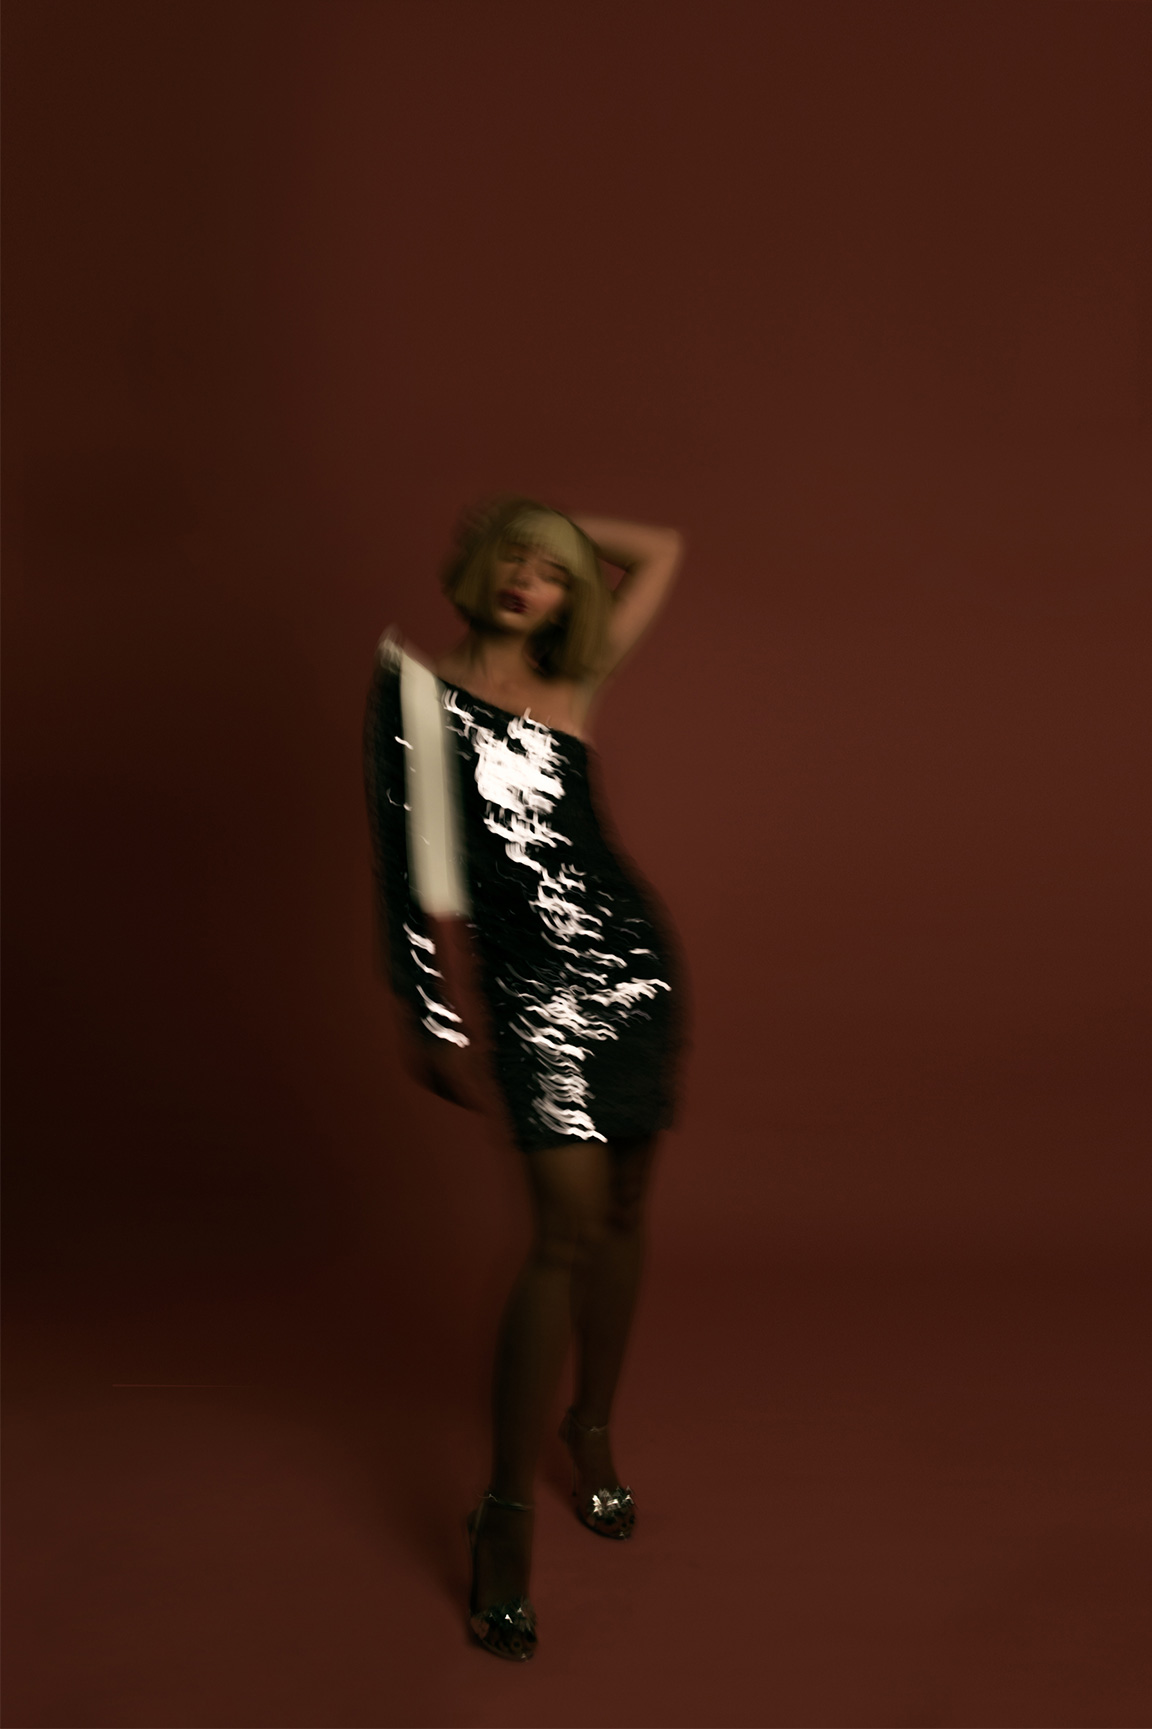 leam edit doll r editorial self portrait msgm valentino shirt jumpsuit